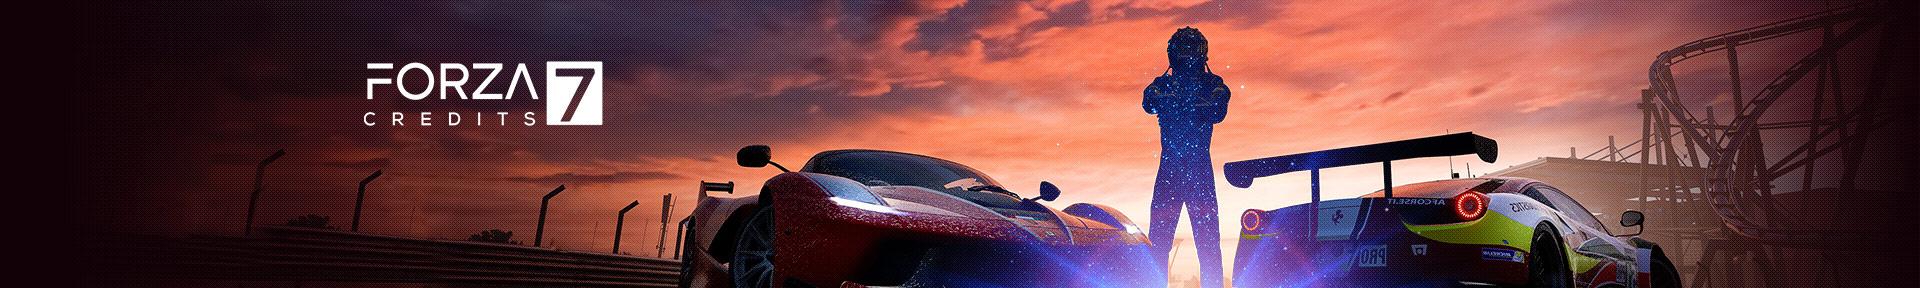 Forza Motorsport 7 Credits